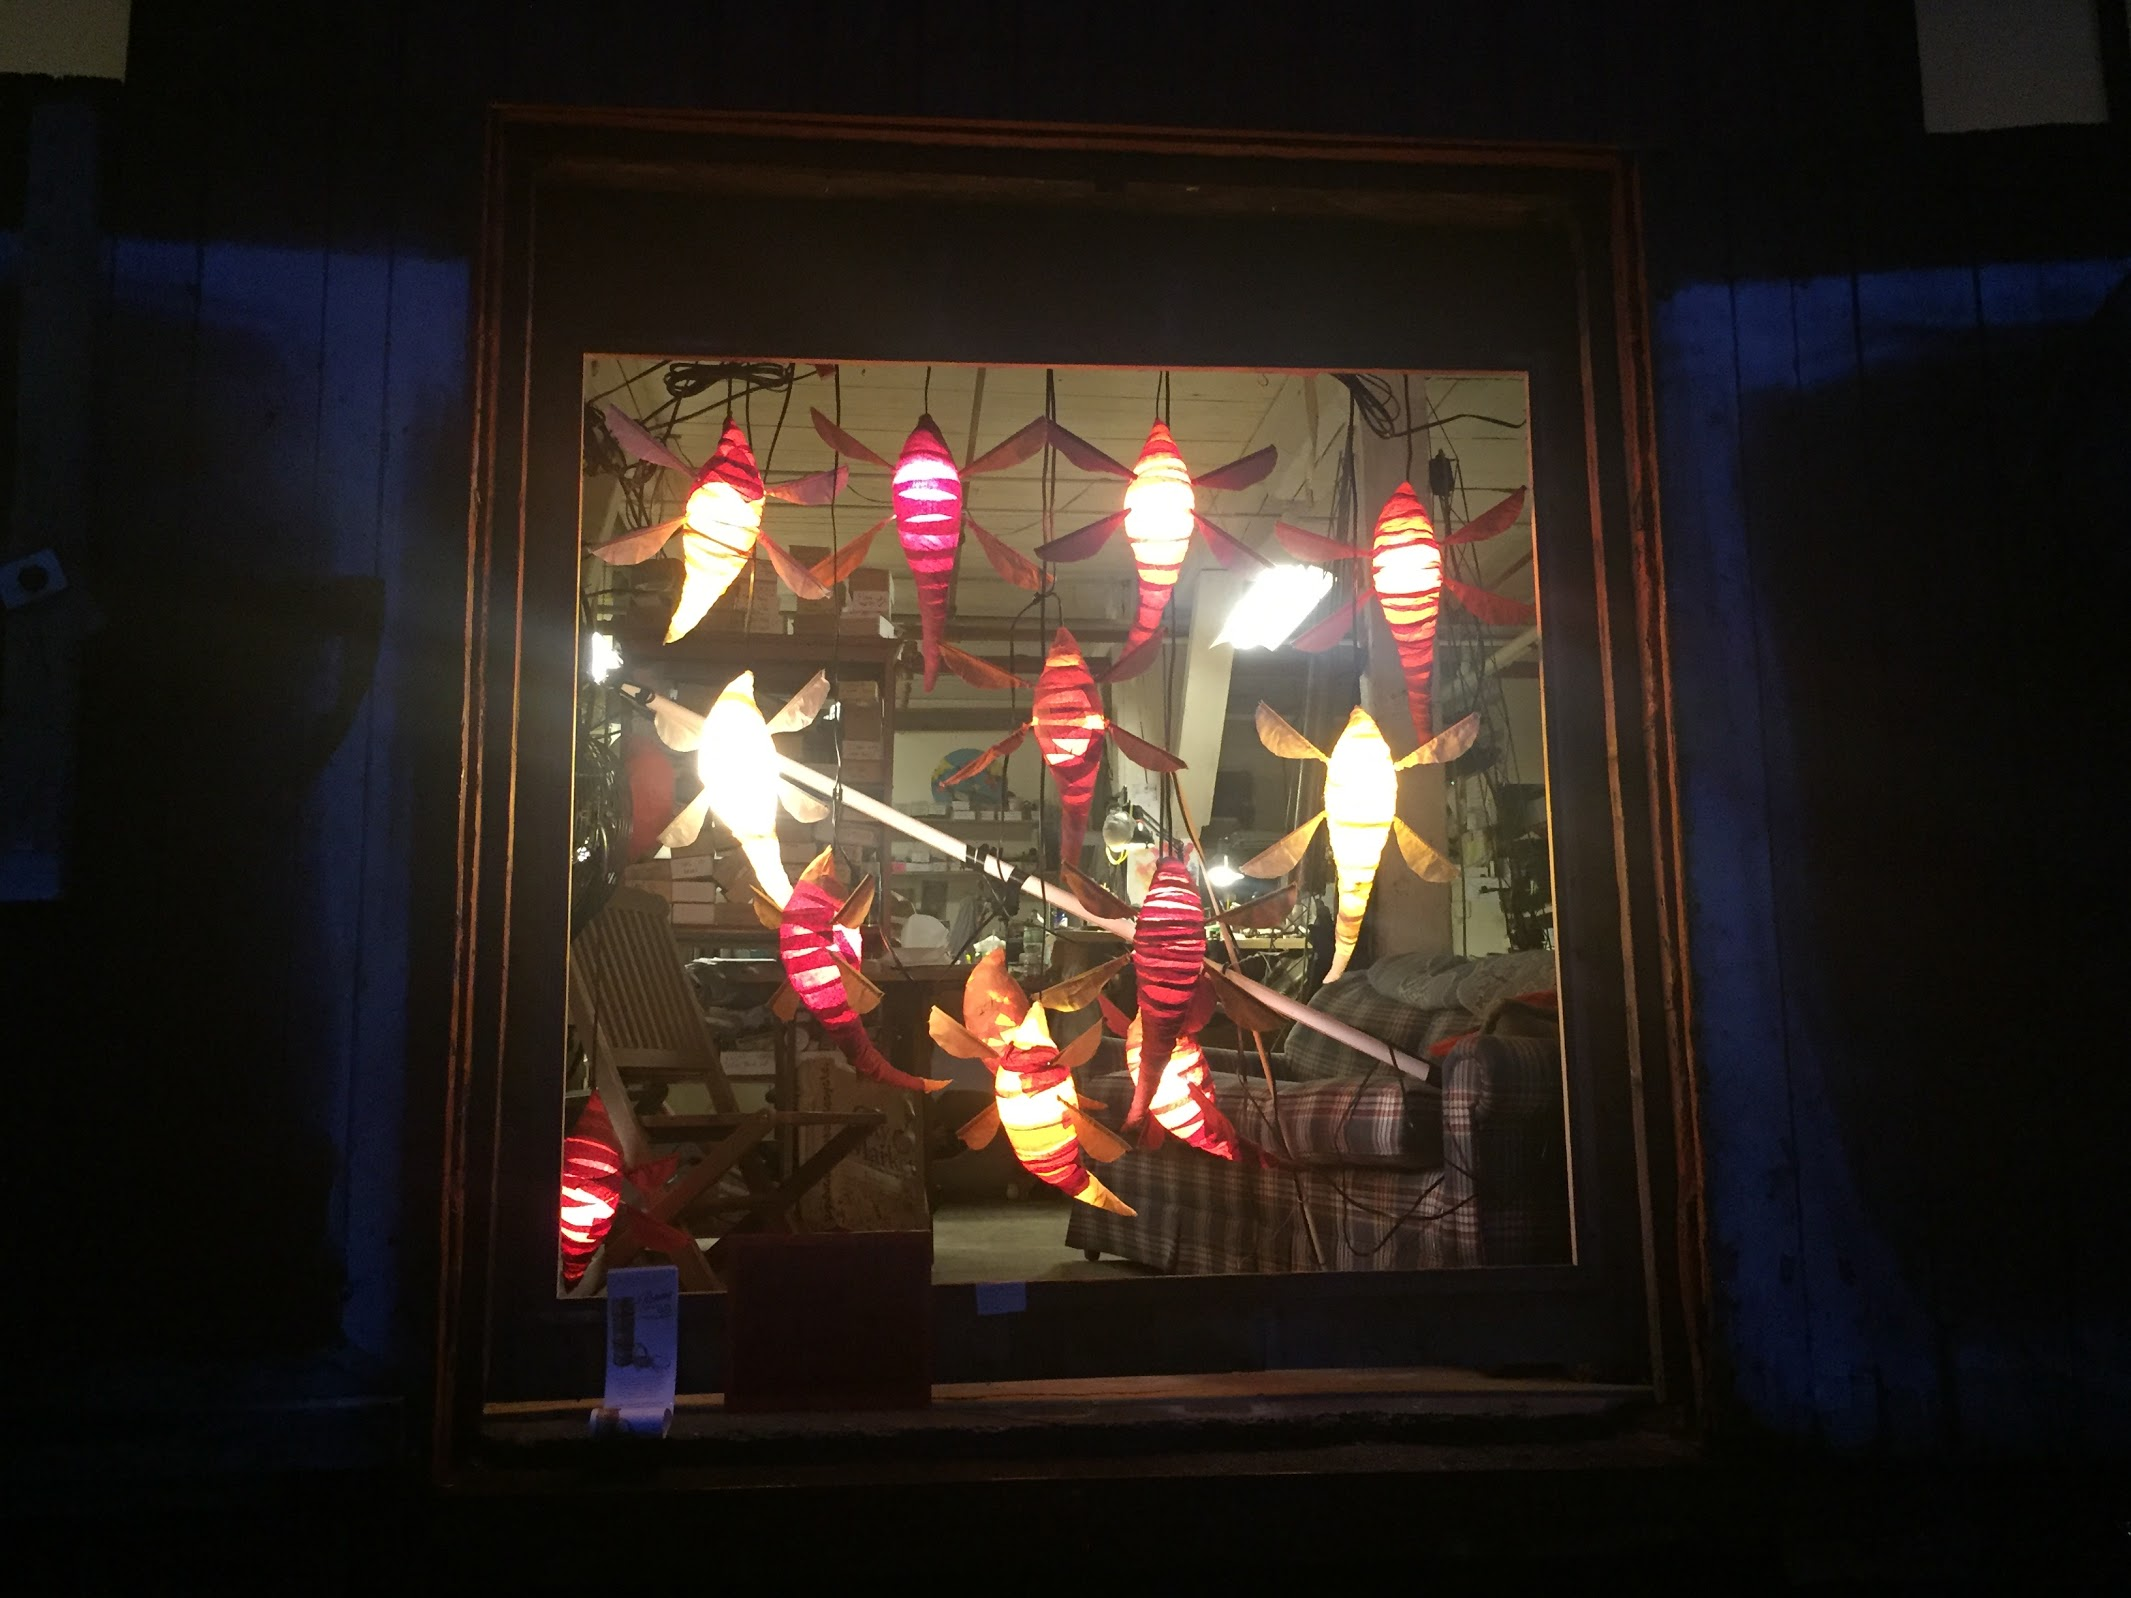 chrysalis_window_night.JPG